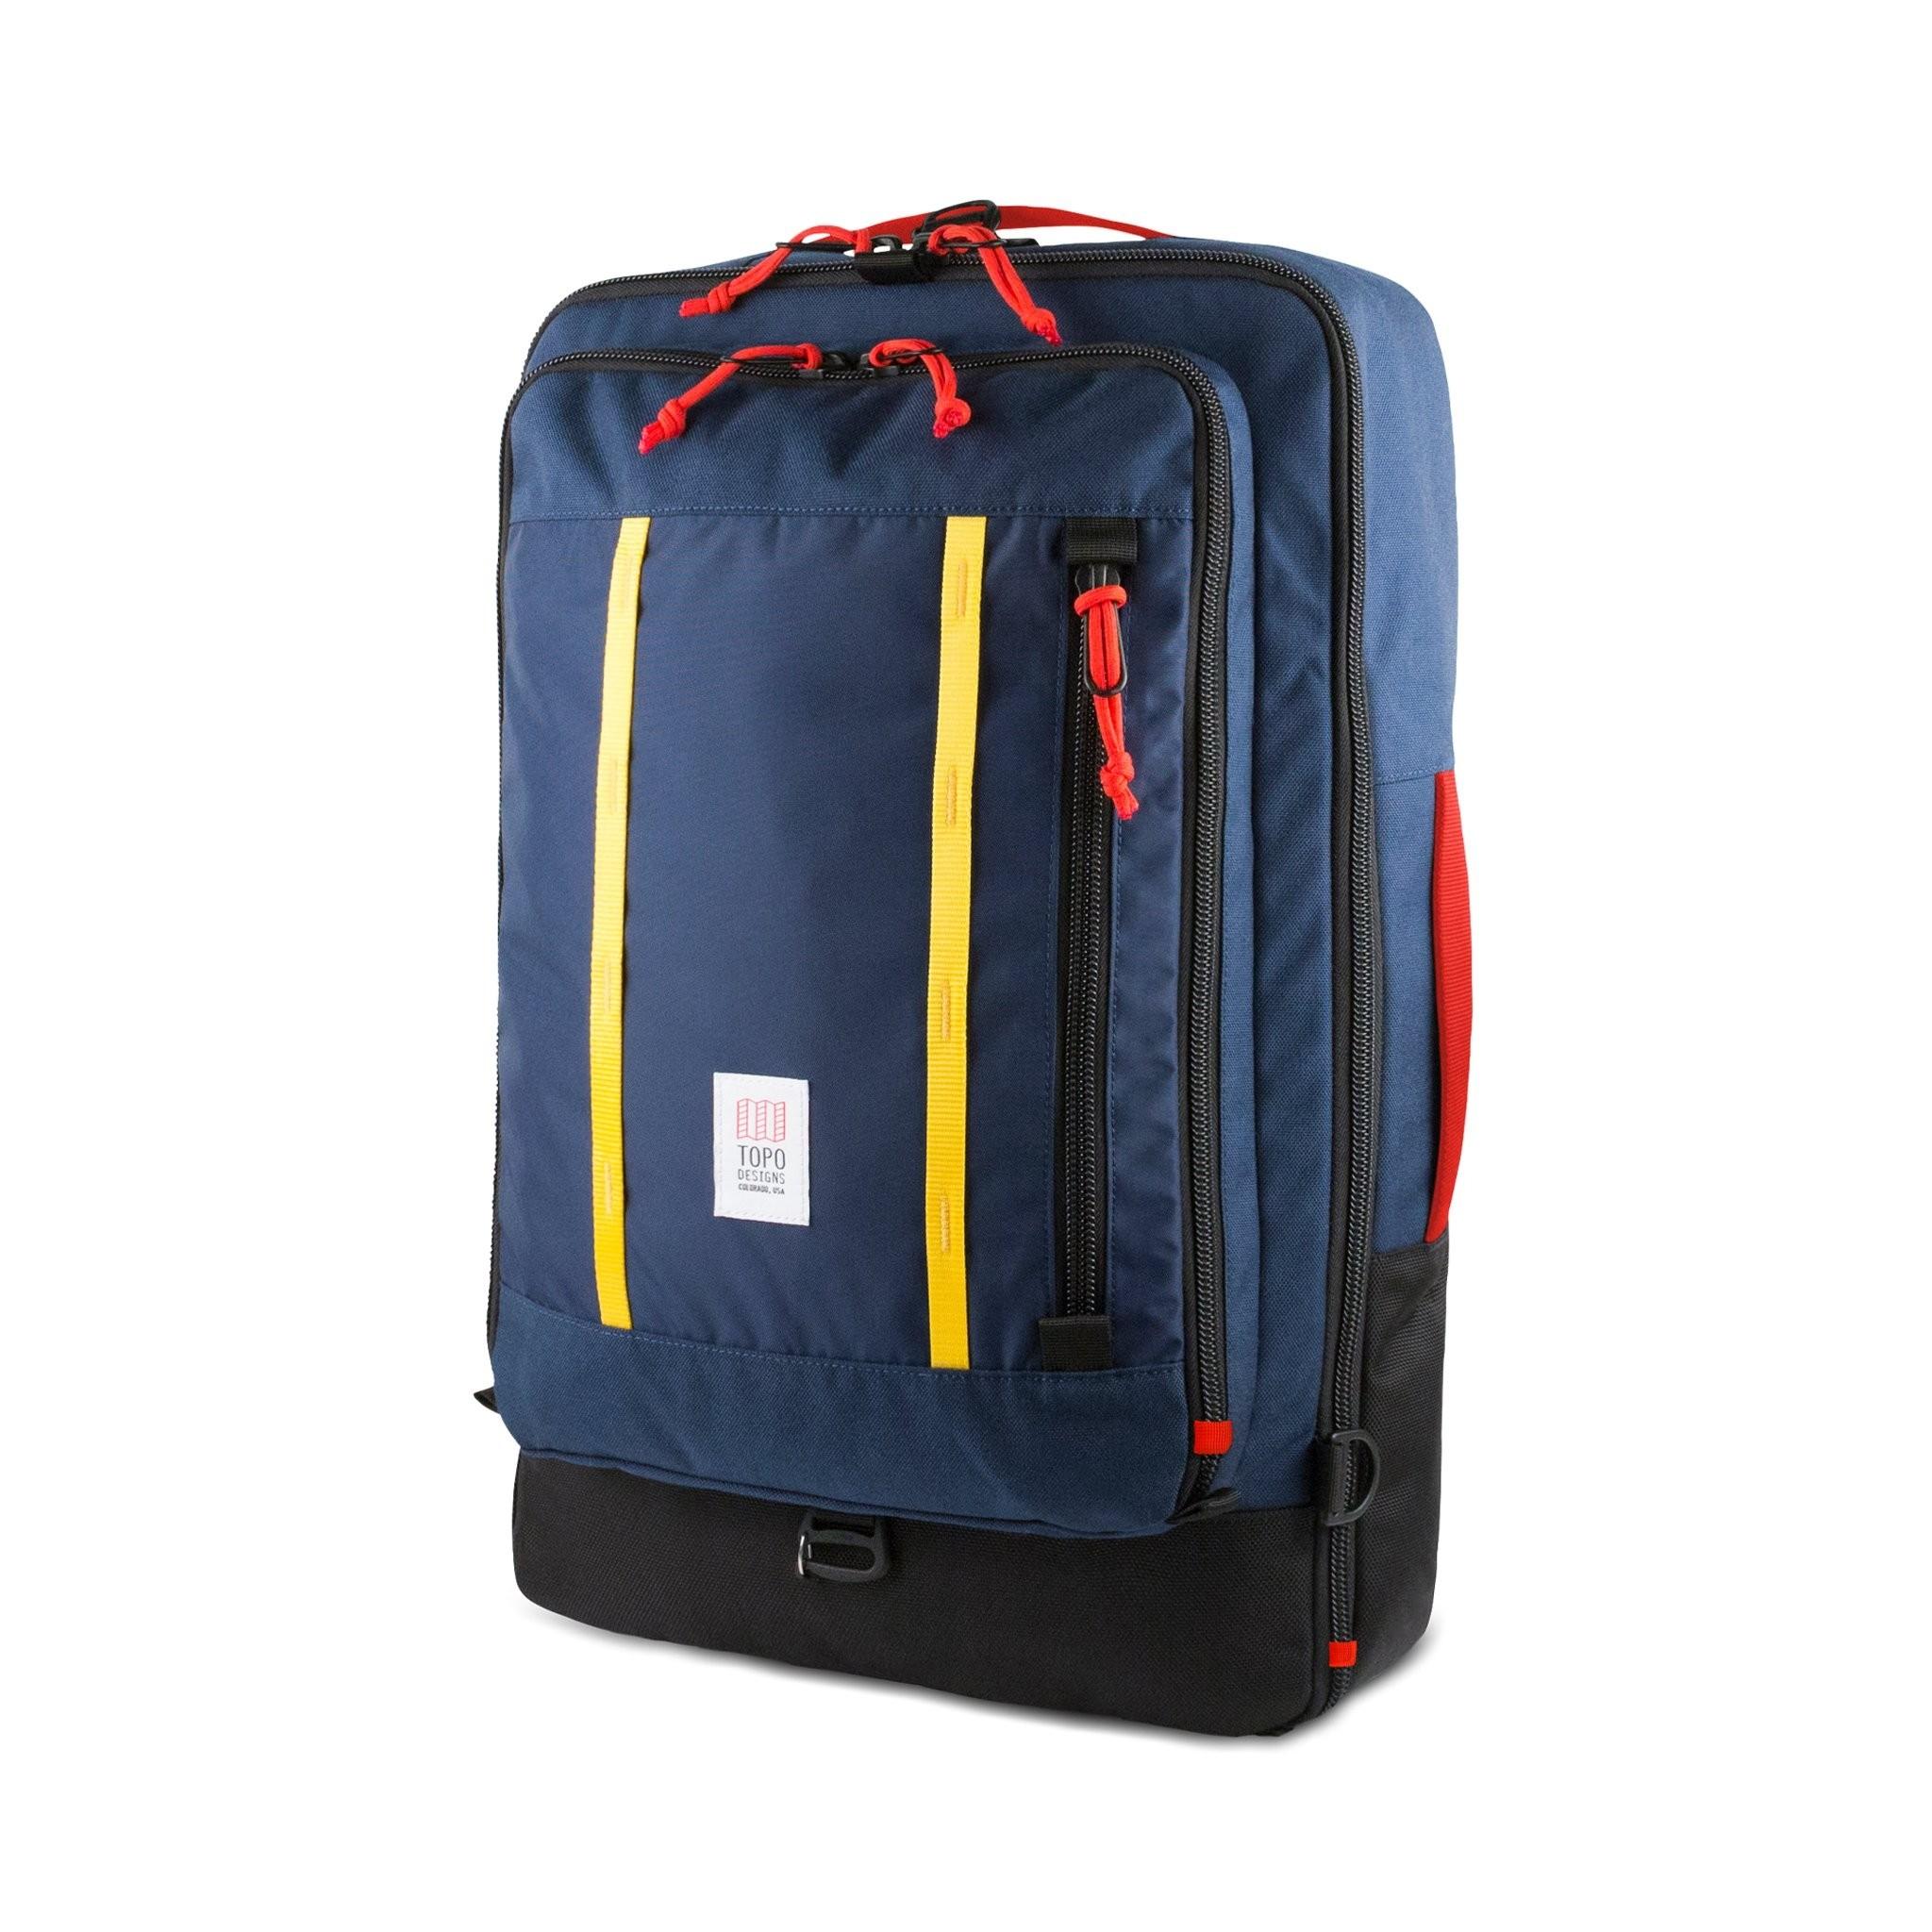 Topo Designs Travel Bag 40L : Navy